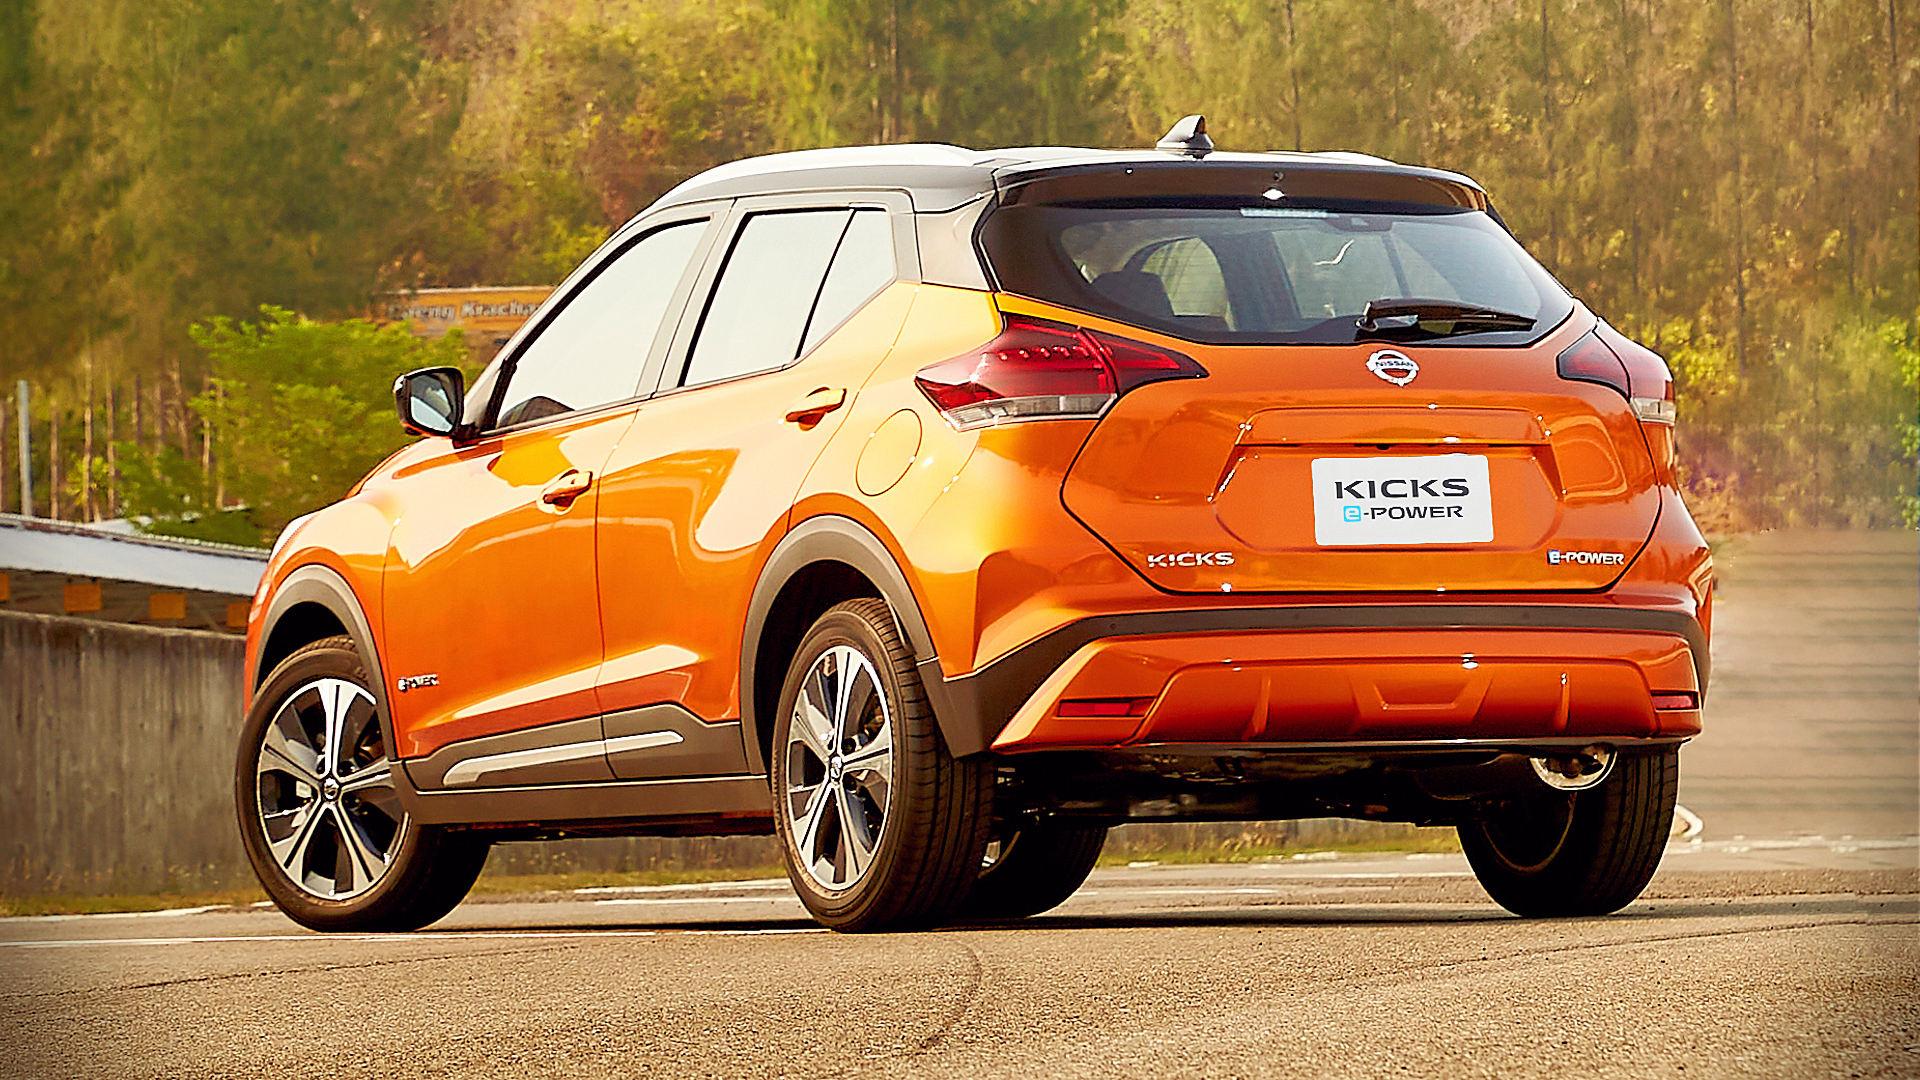 Nissan Kicks 2020 E-Power Images